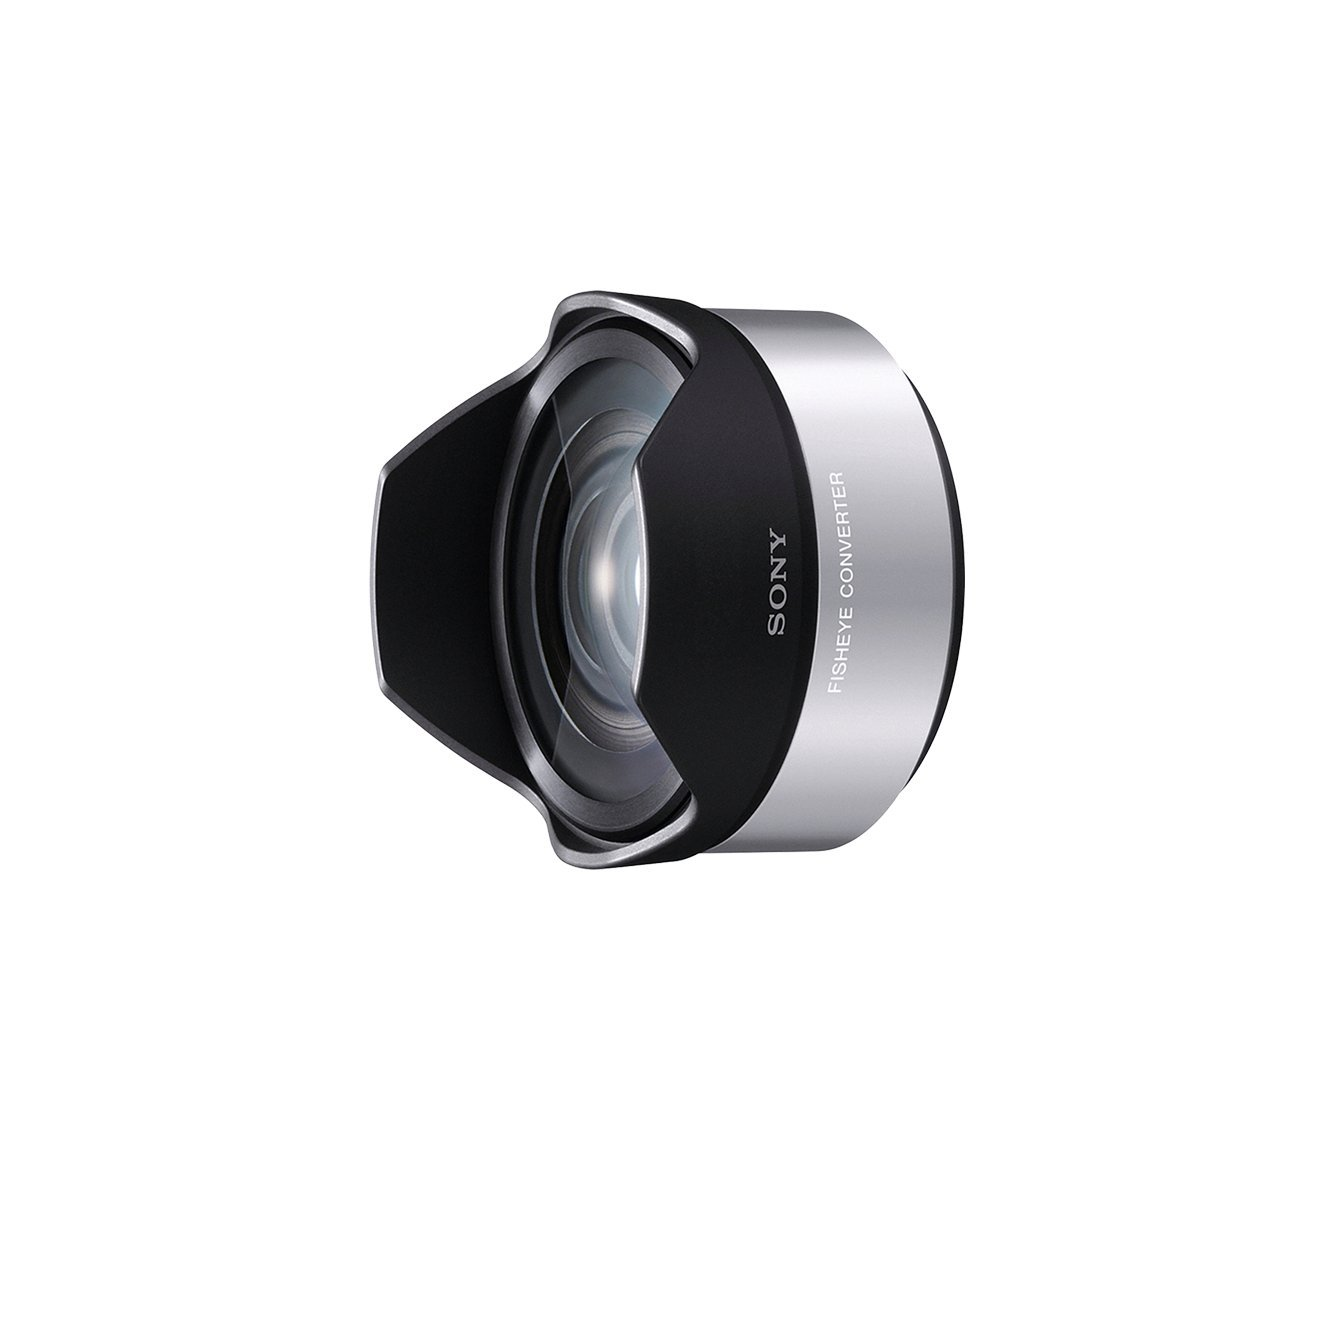 Sony VCL-ECF1 Fisheye Converter